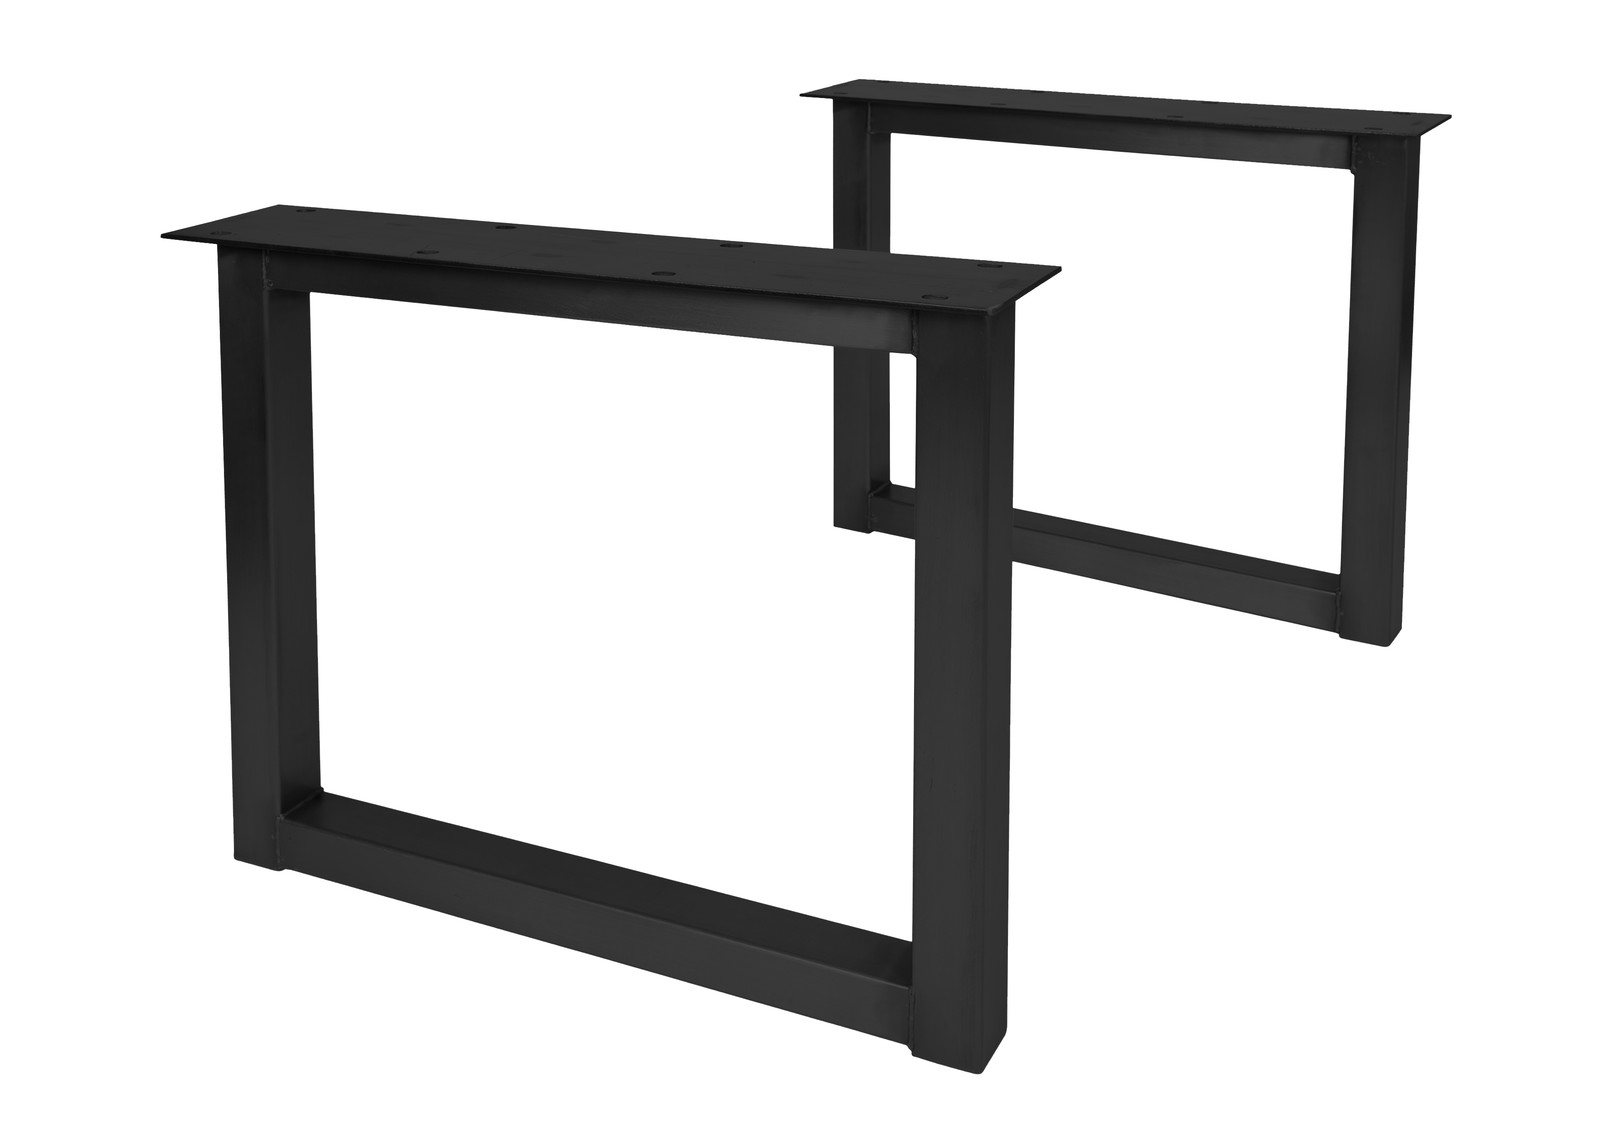 TOPS & TABLES Tischgestell antikschwarz